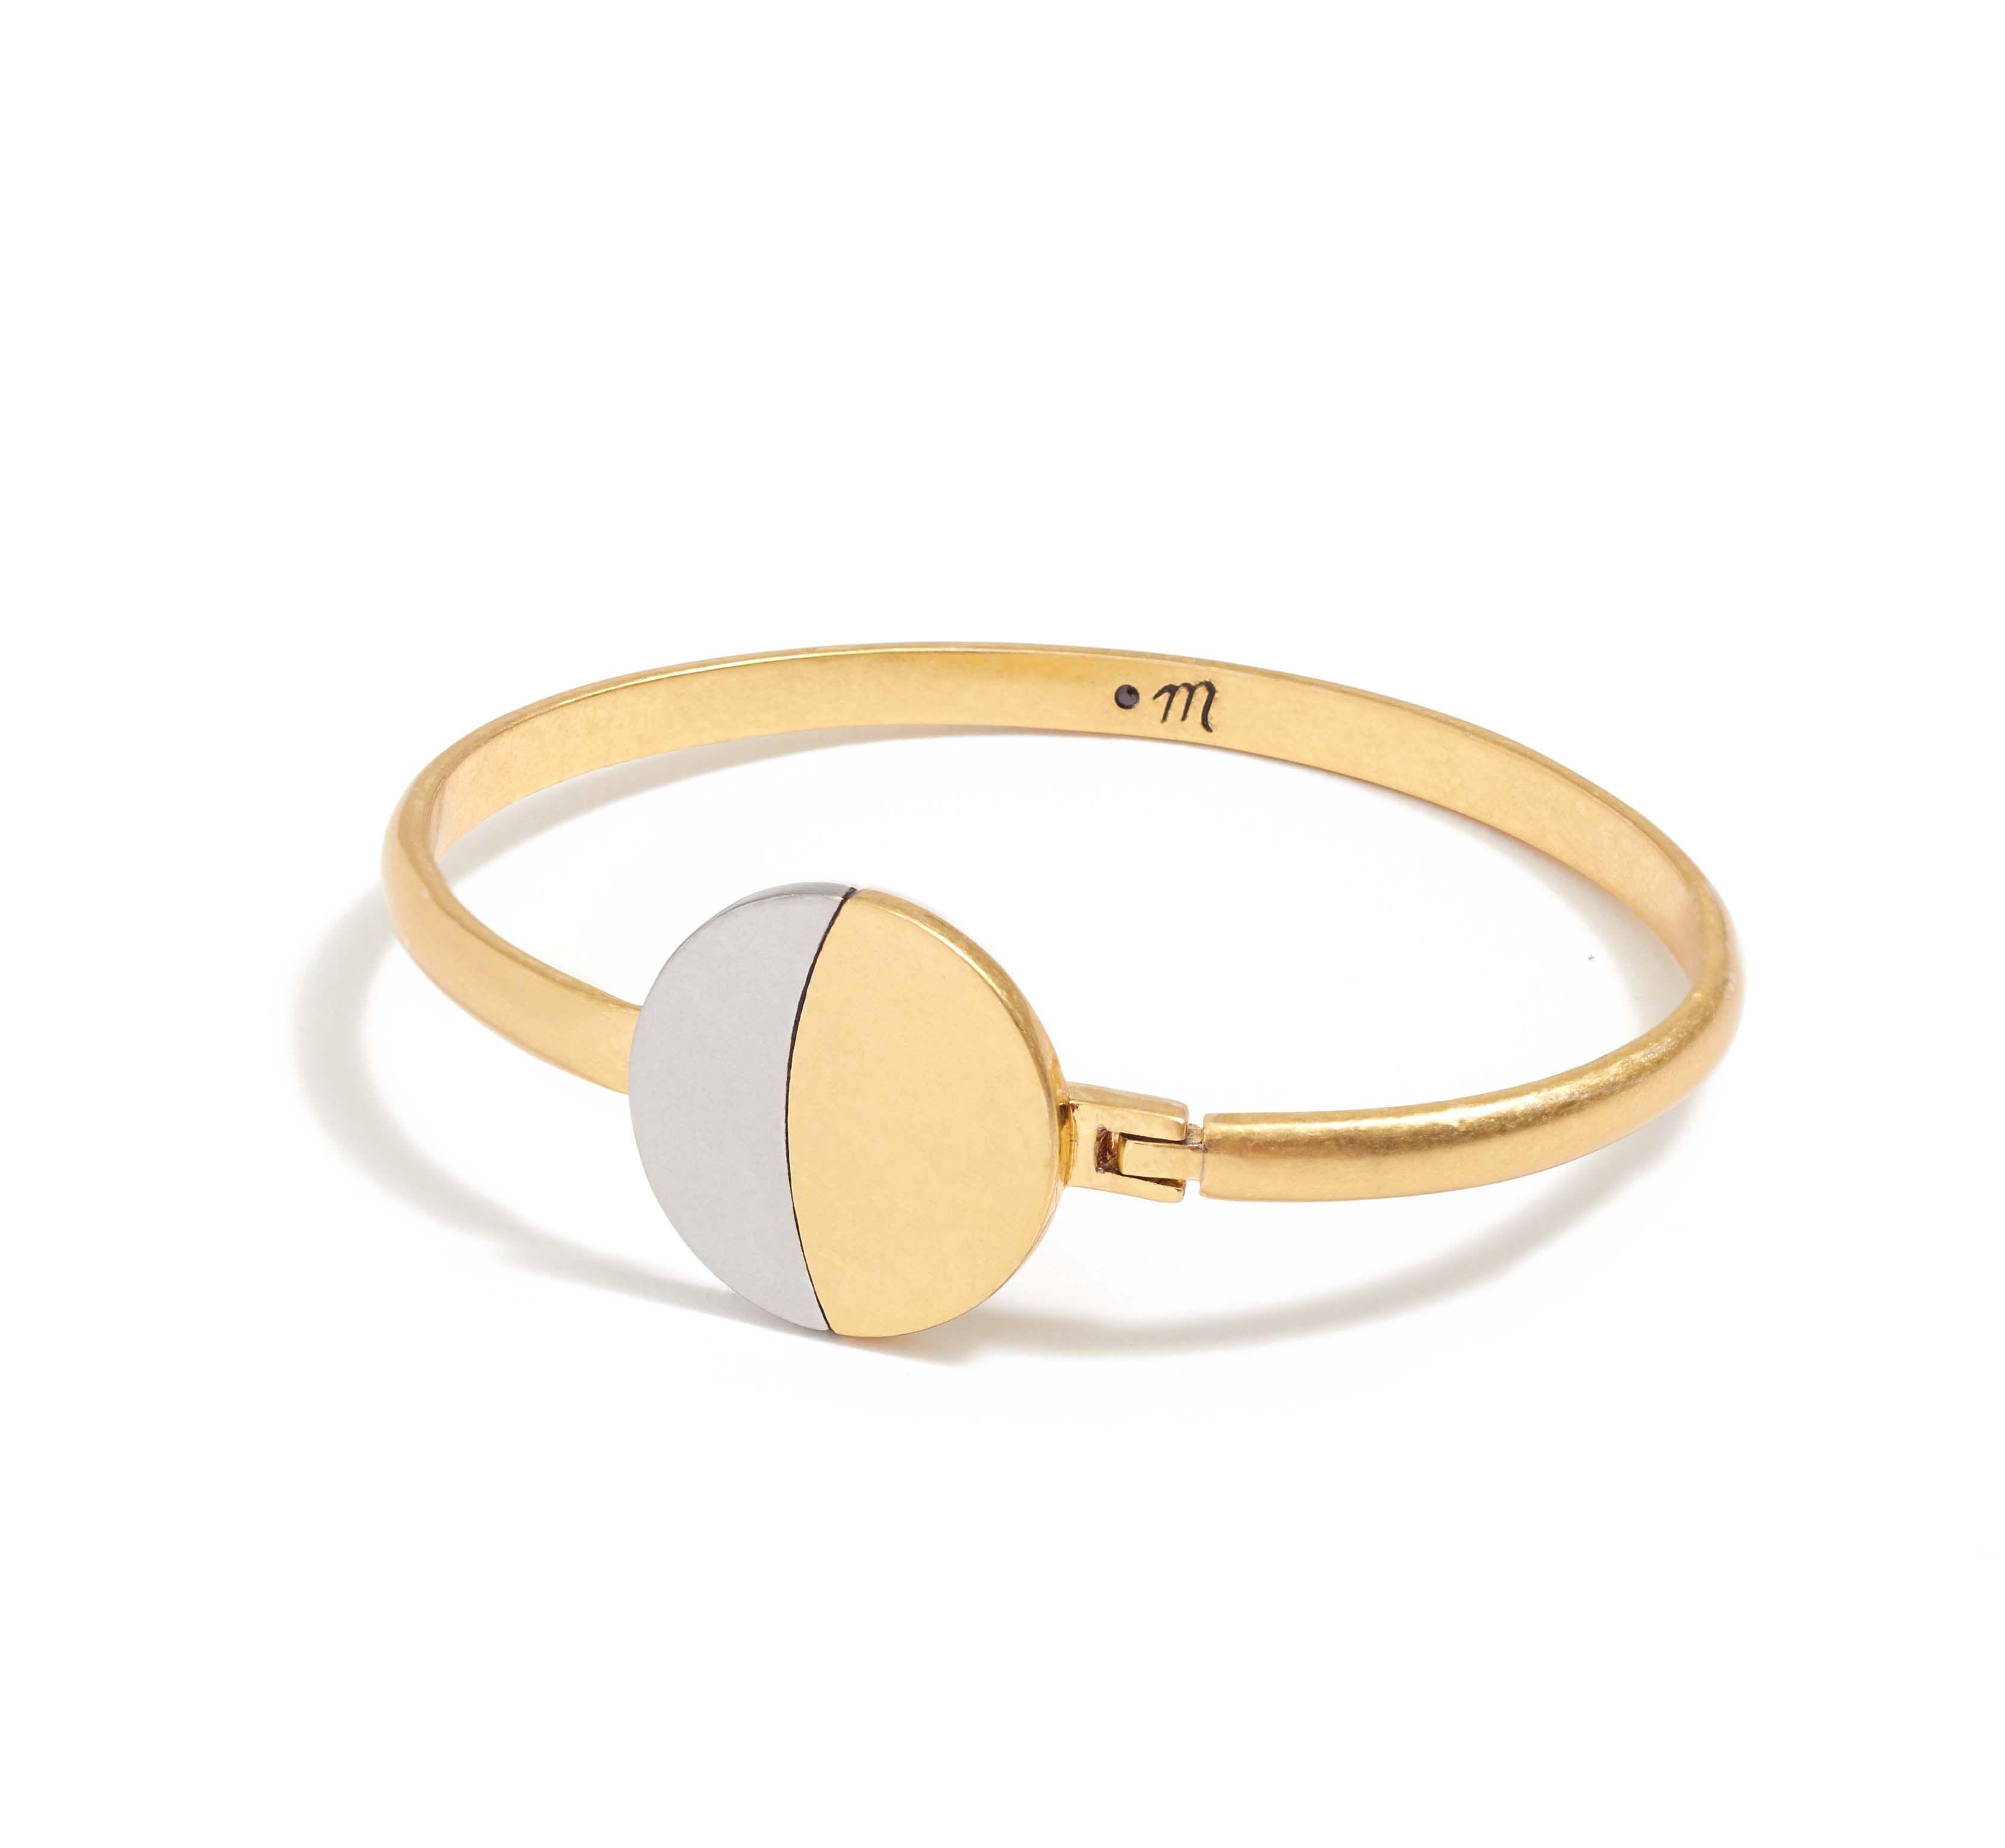 madewell moonspell cuff bracelet. #everydaymadewell